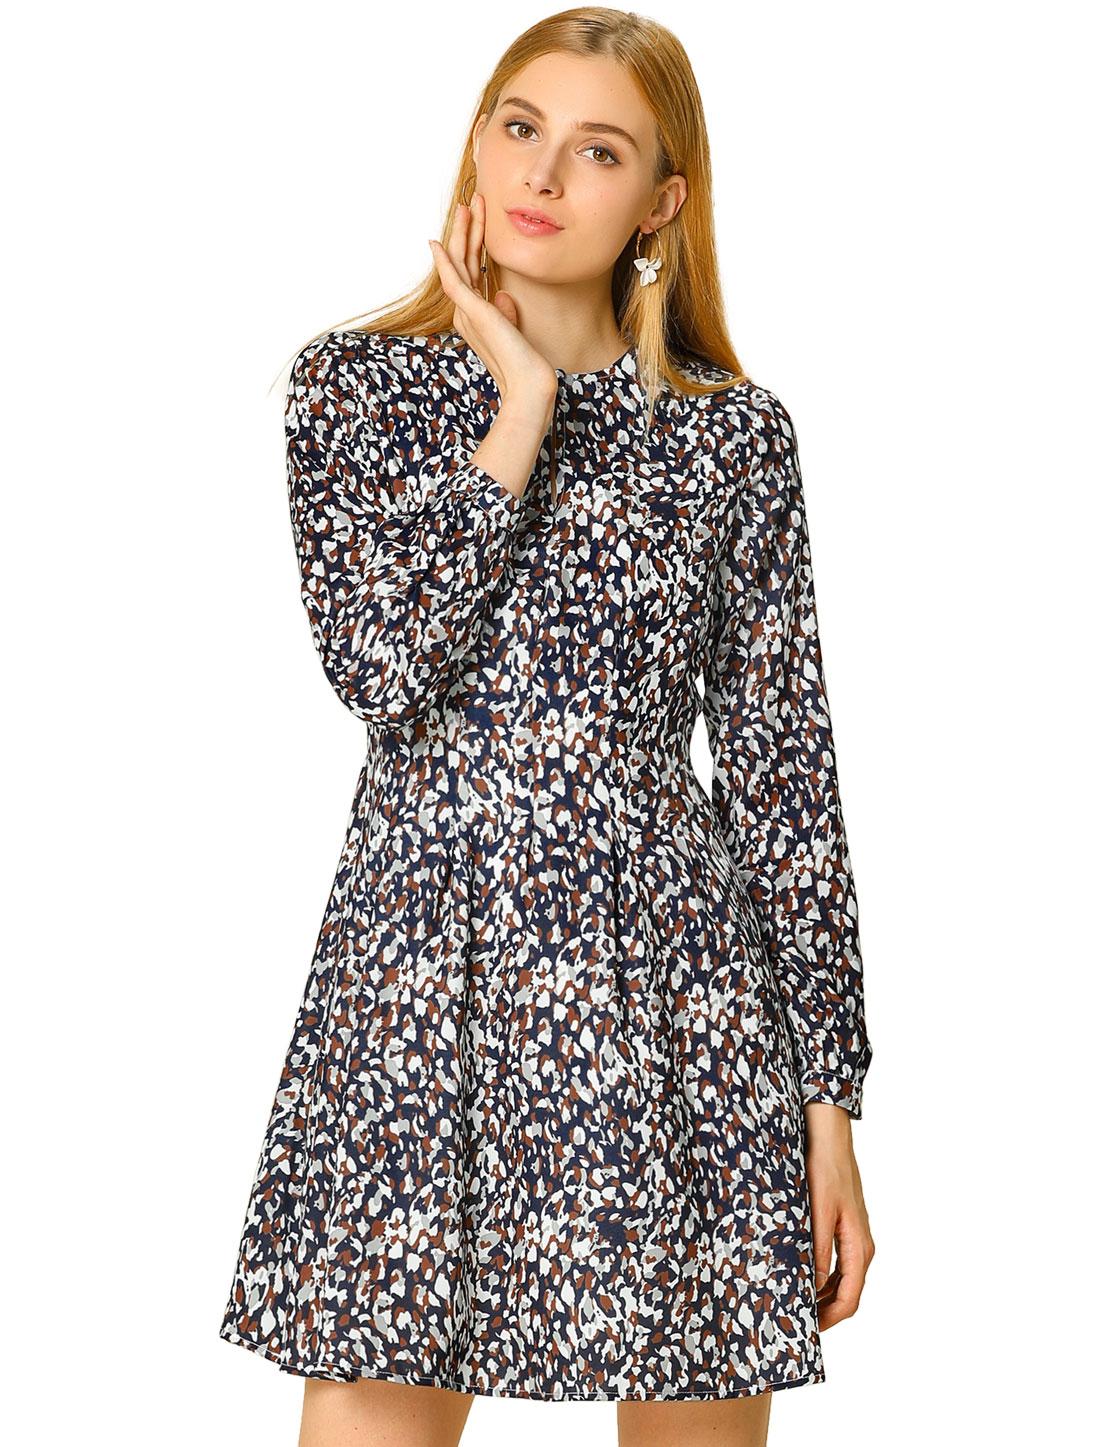 Allegra K Women's A-line Pleated Flared Leopard Dress Navy Blue XL (US 18)